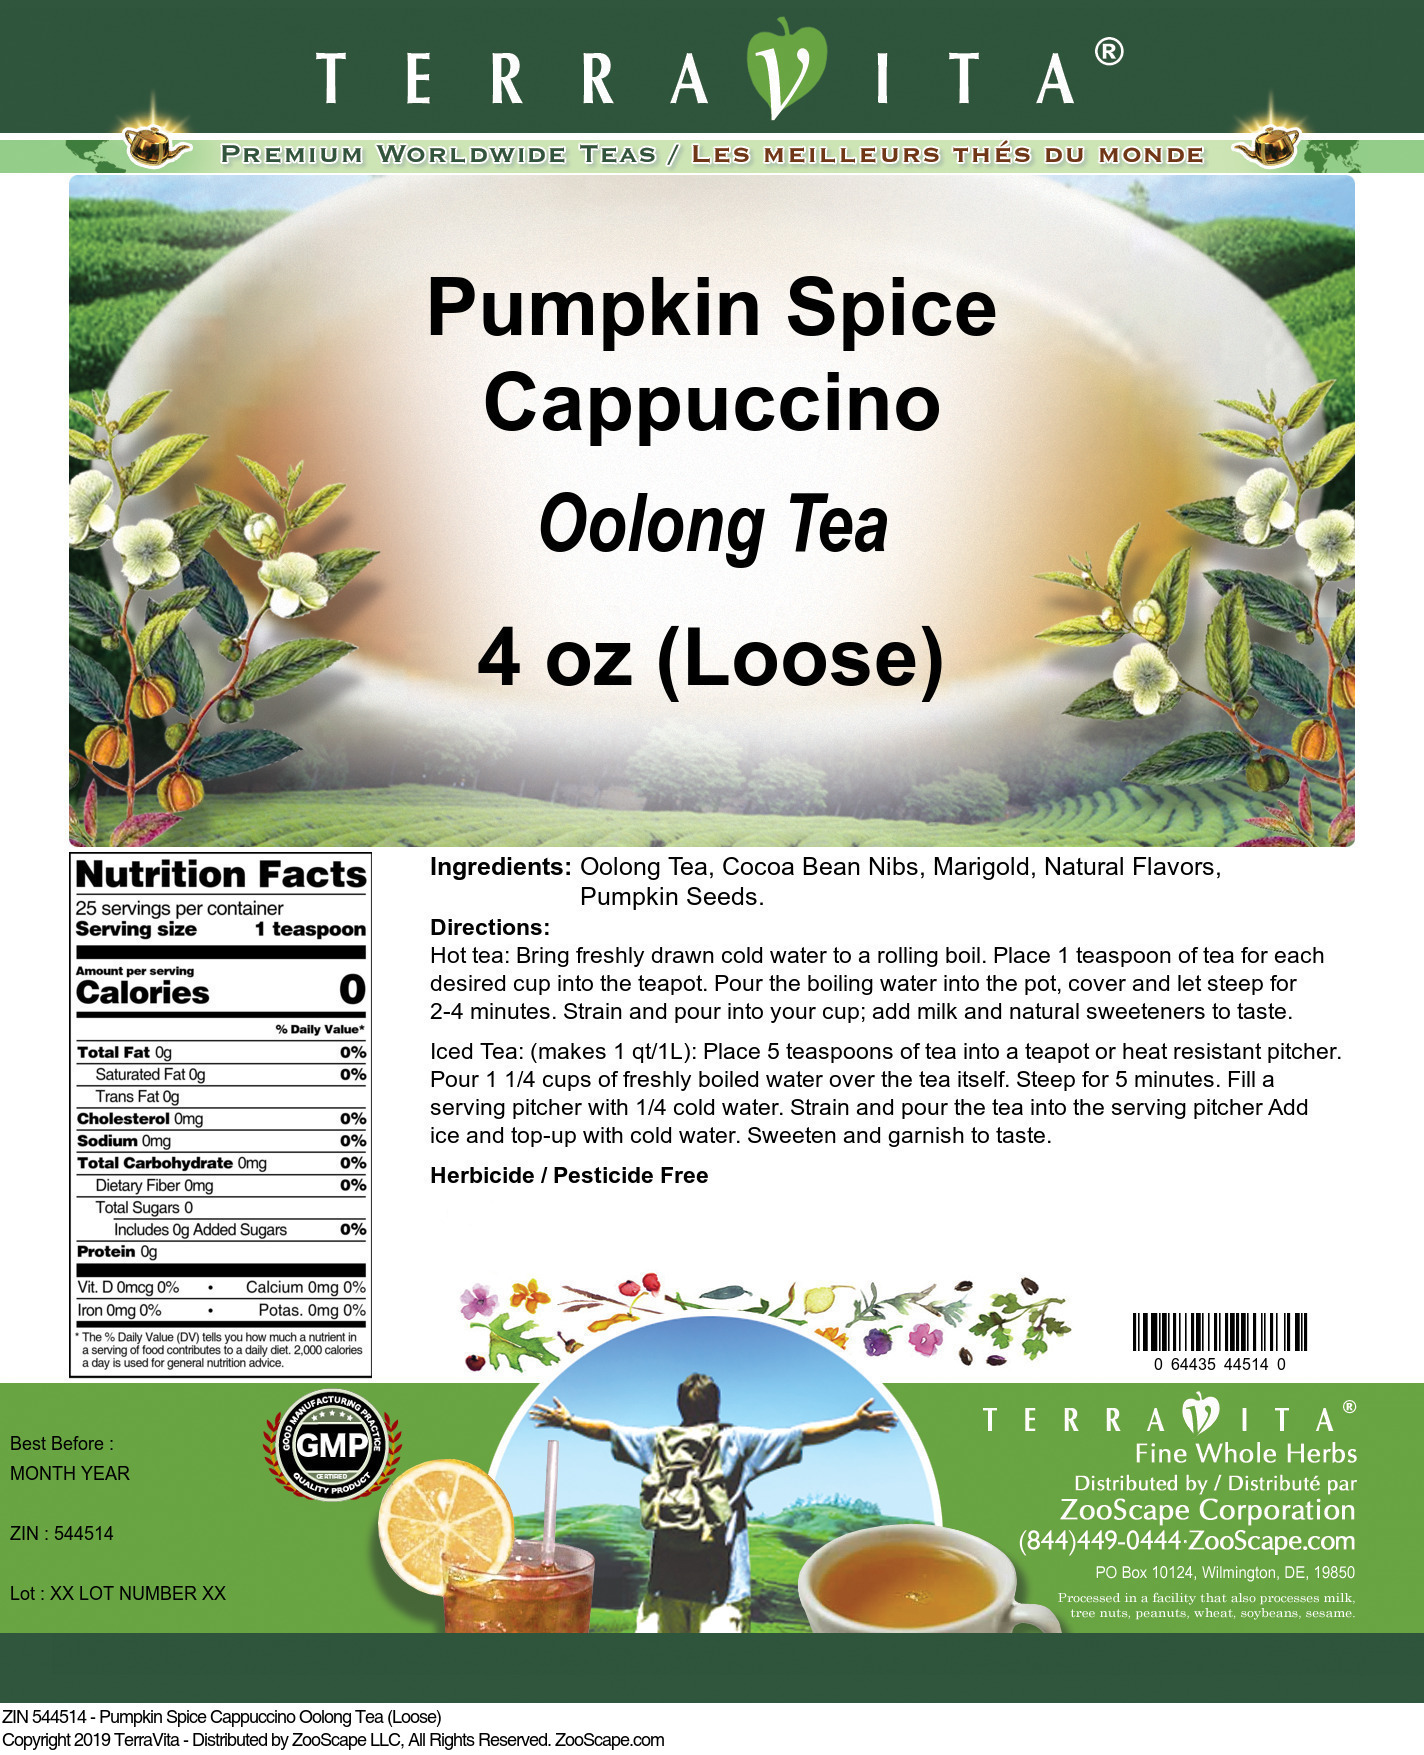 Pumpkin Spice Cappuccino Oolong Tea (Loose)